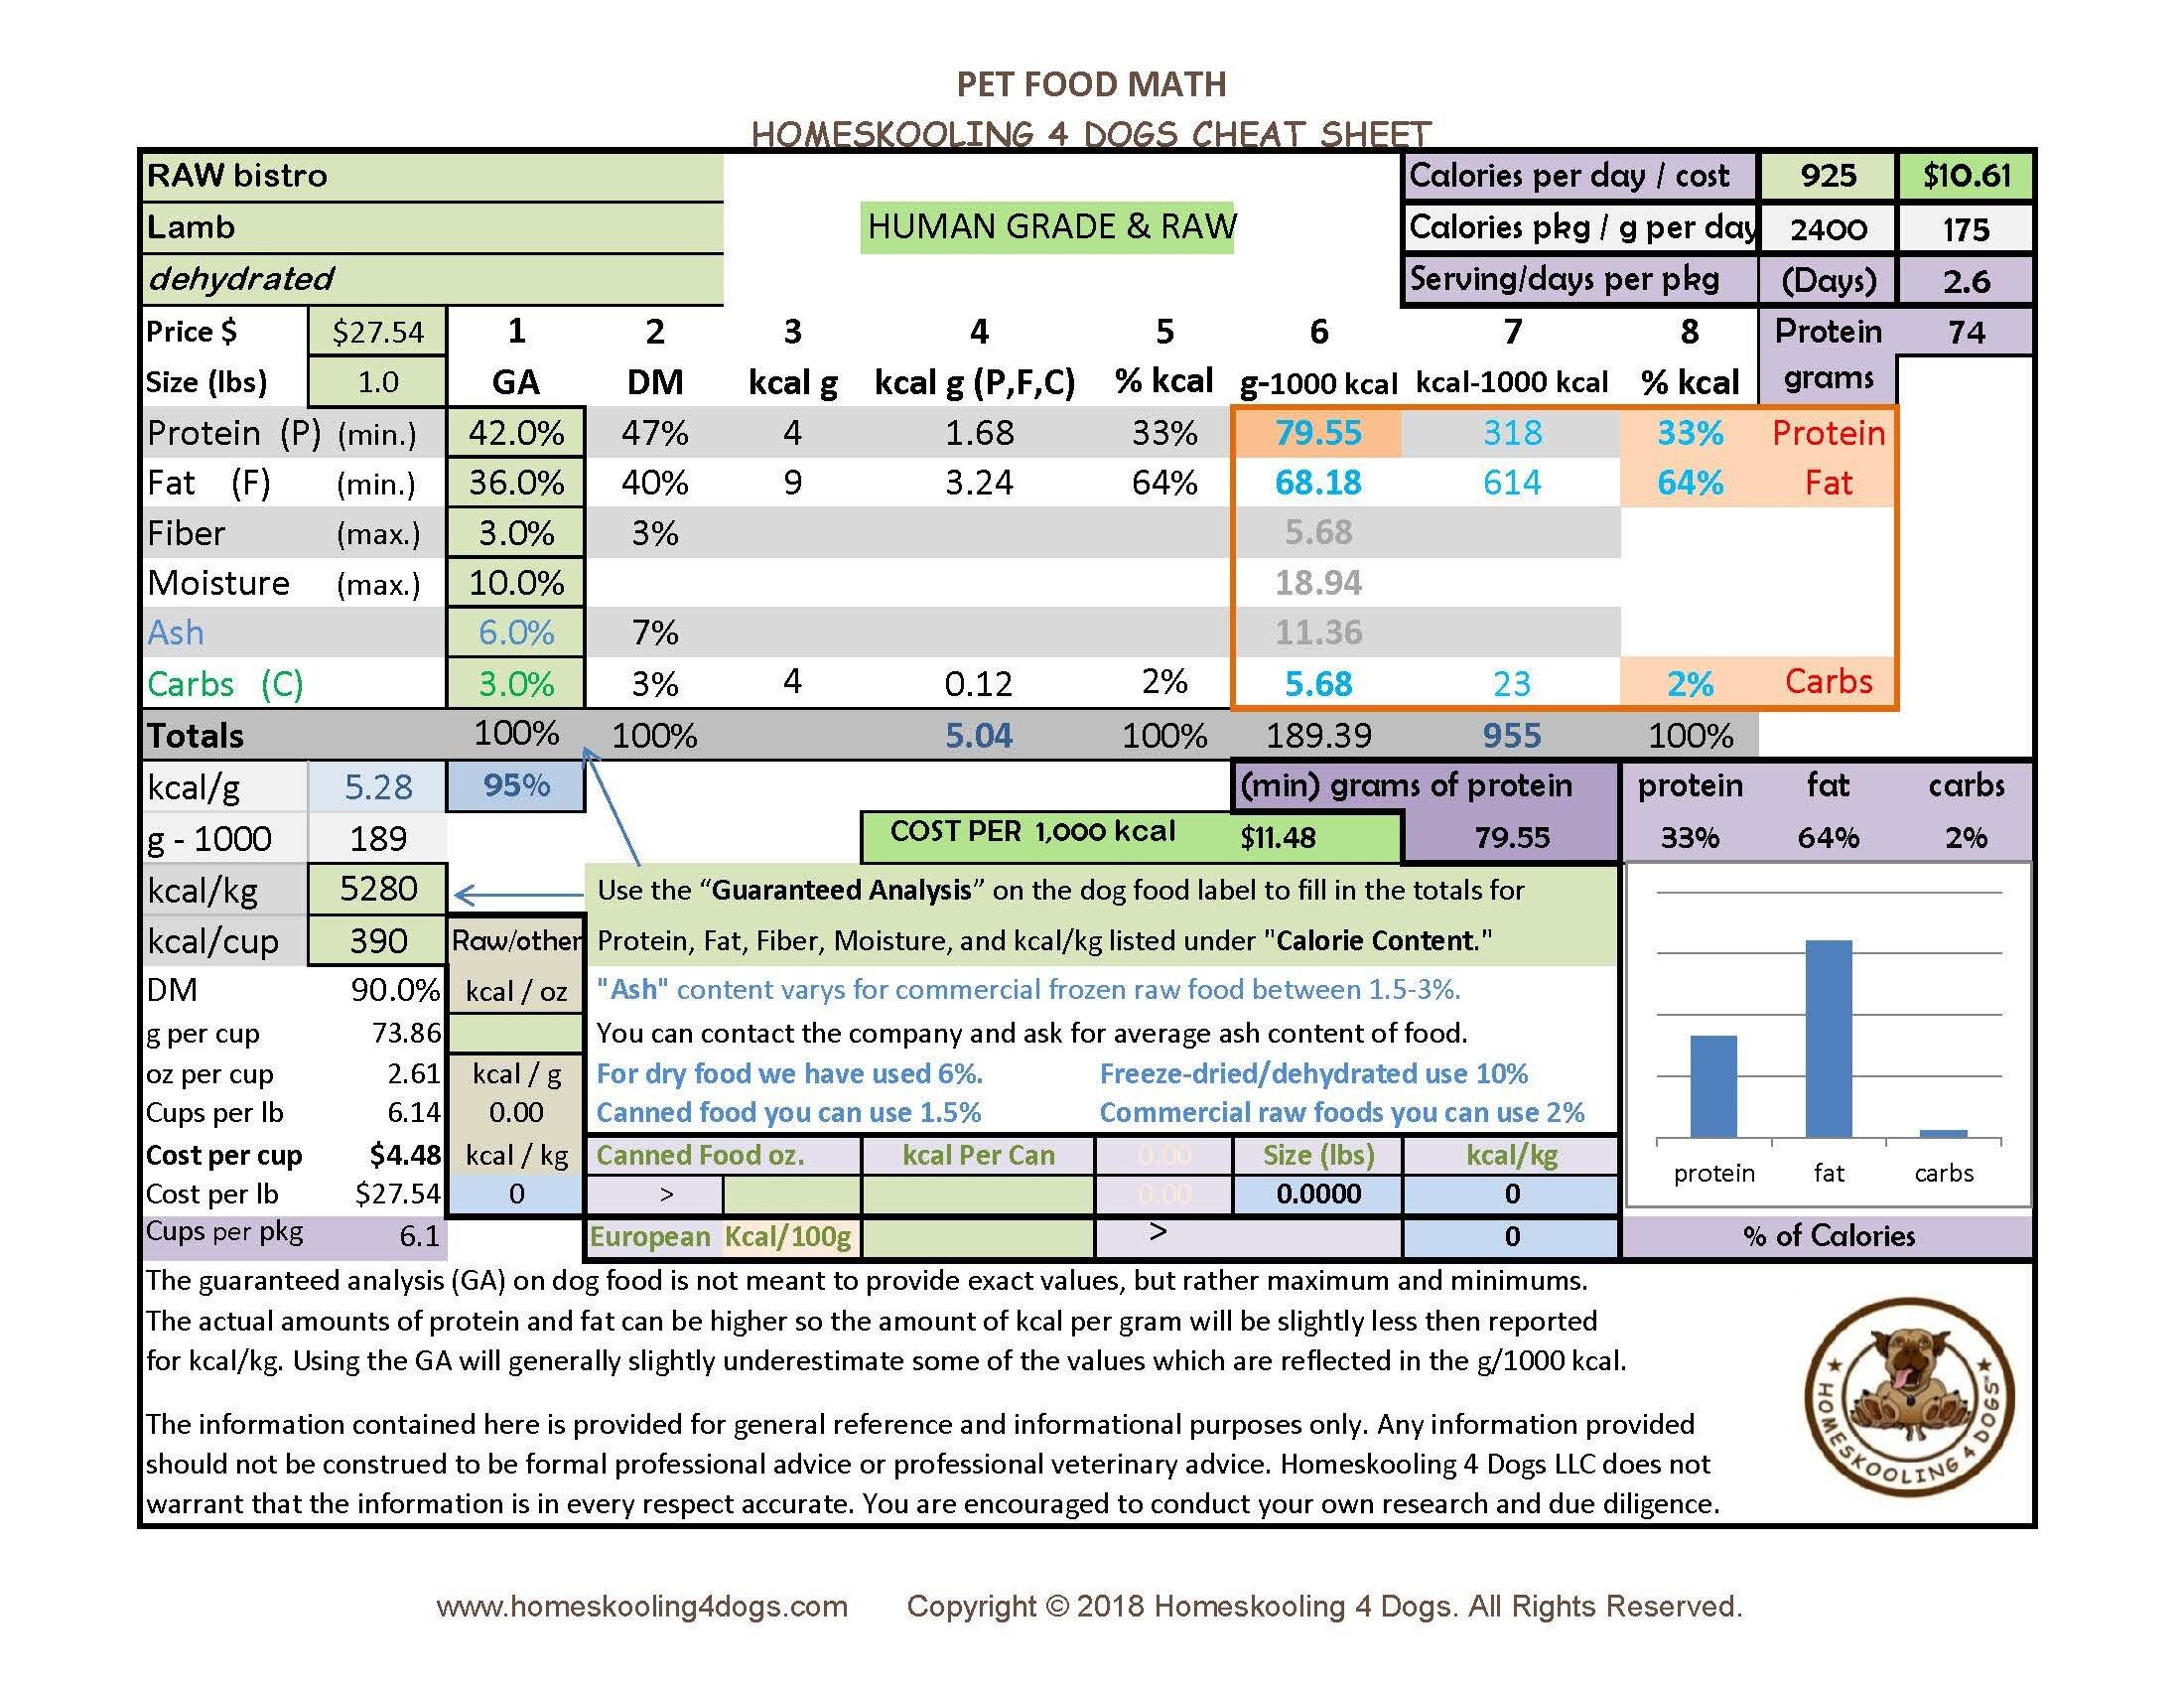 RAW bistro lamb dehydrated Pet Food Math Cheat Sheet.jpg